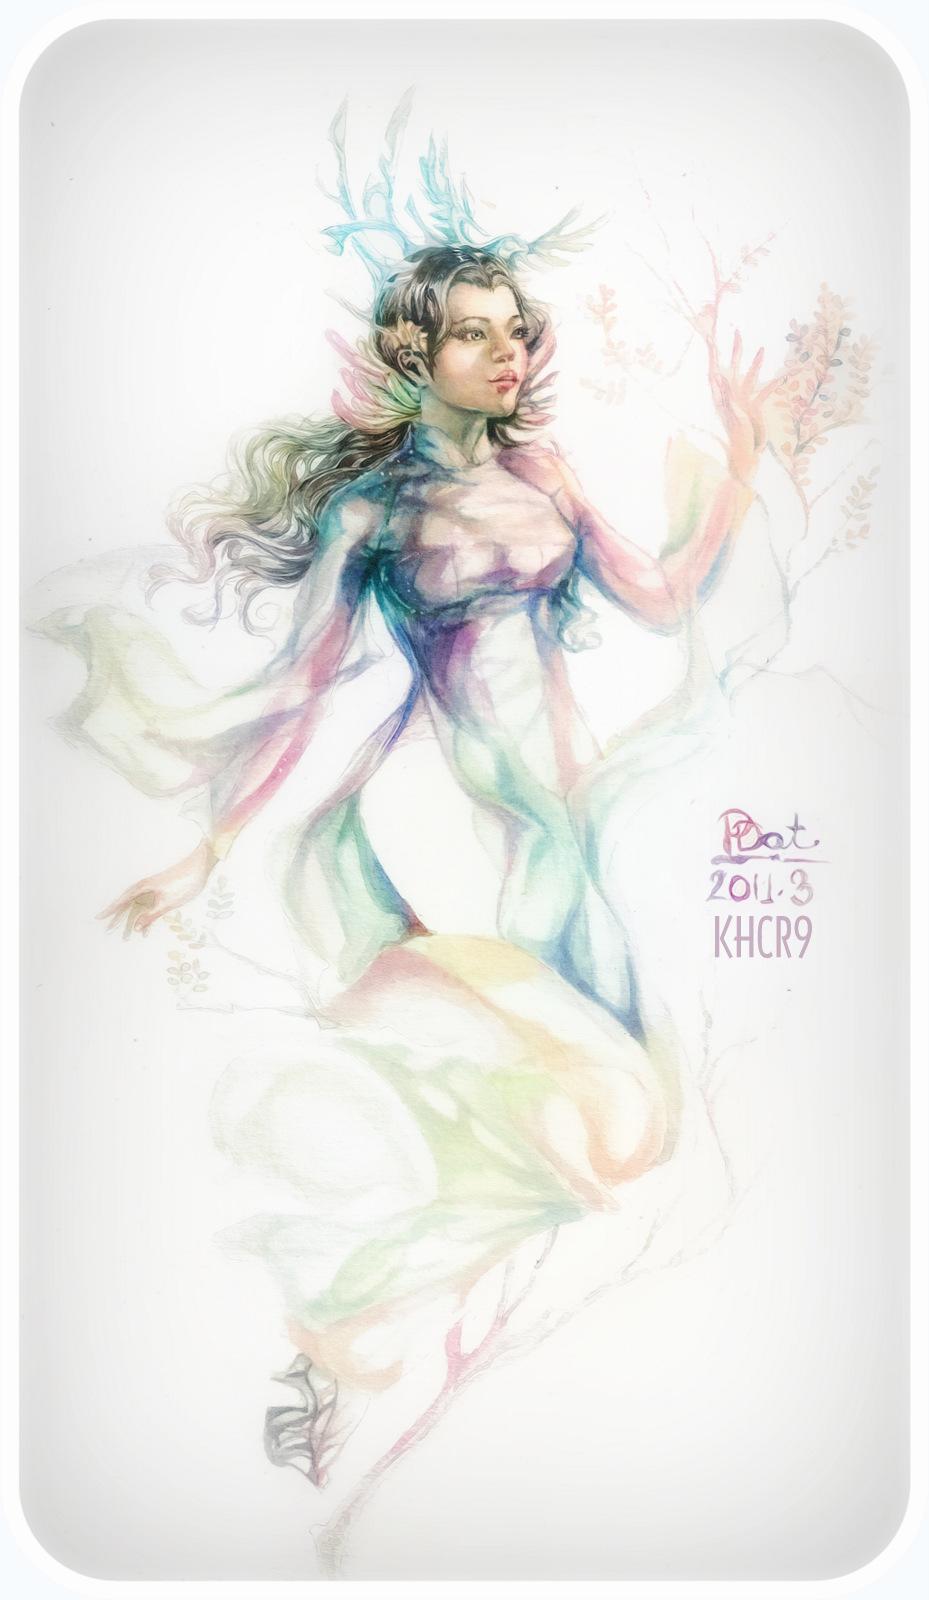 Rainbow goddess by KHCR9